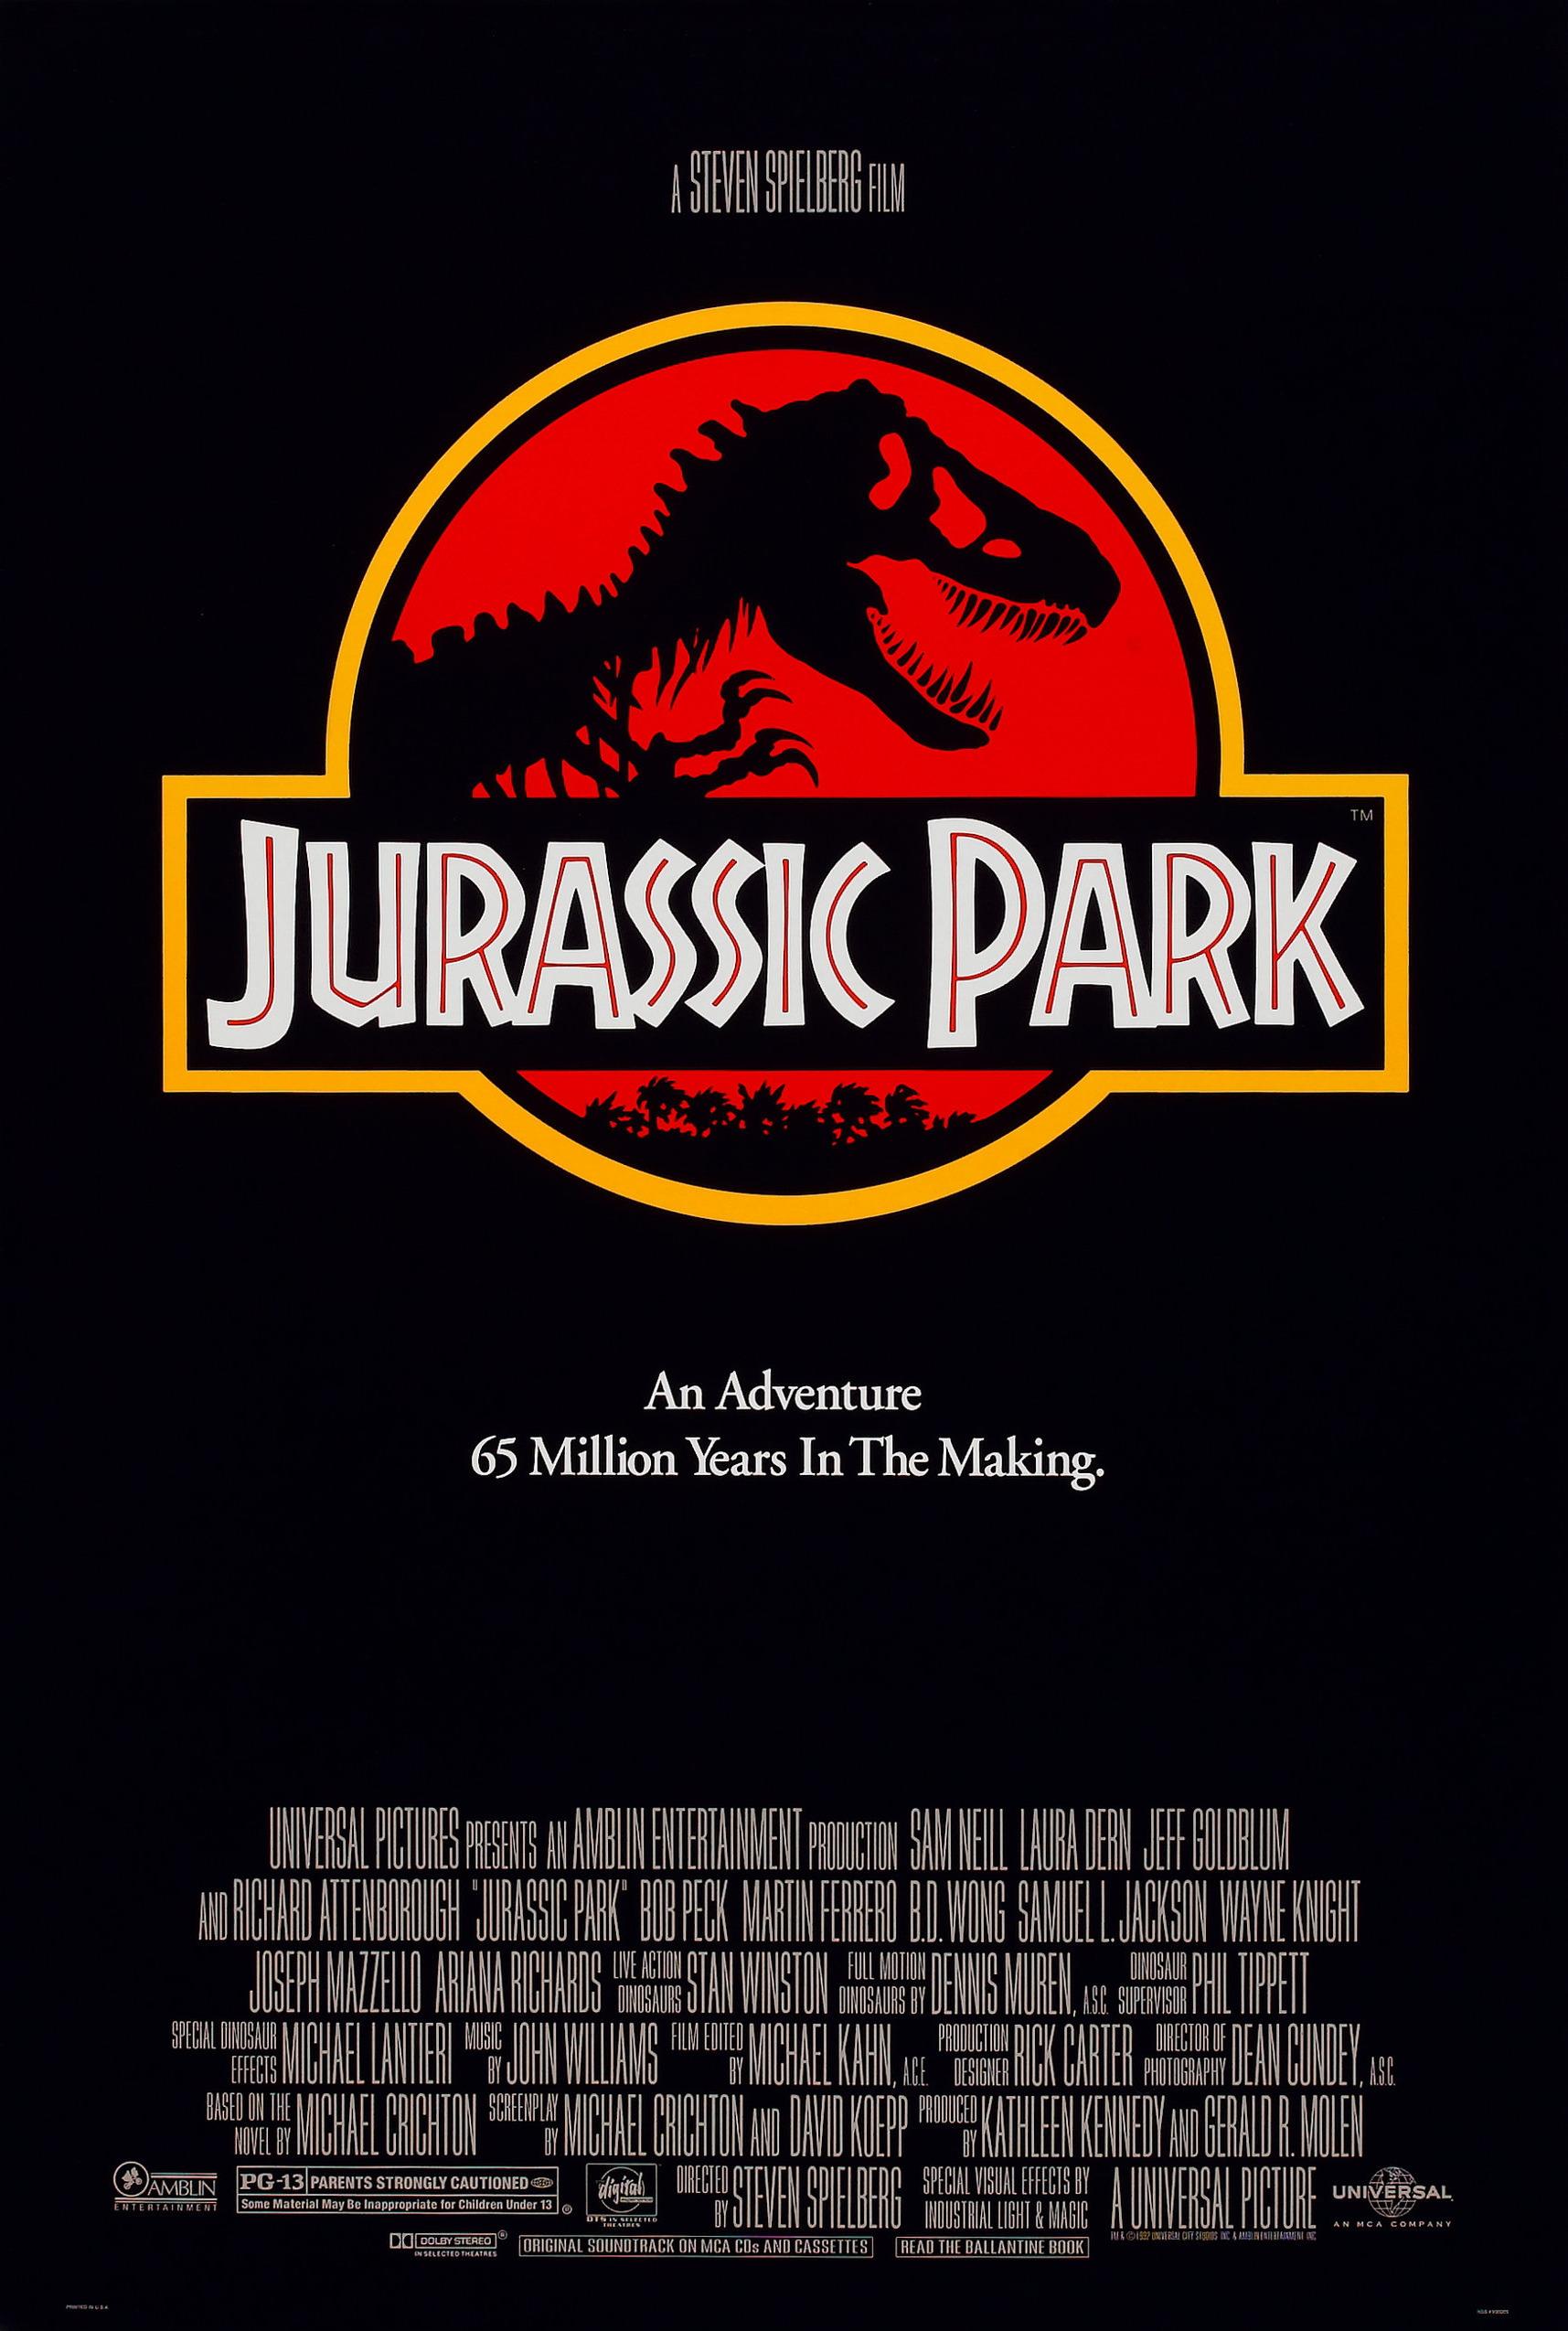 Jurassic Park Film Jurassic Park box sets